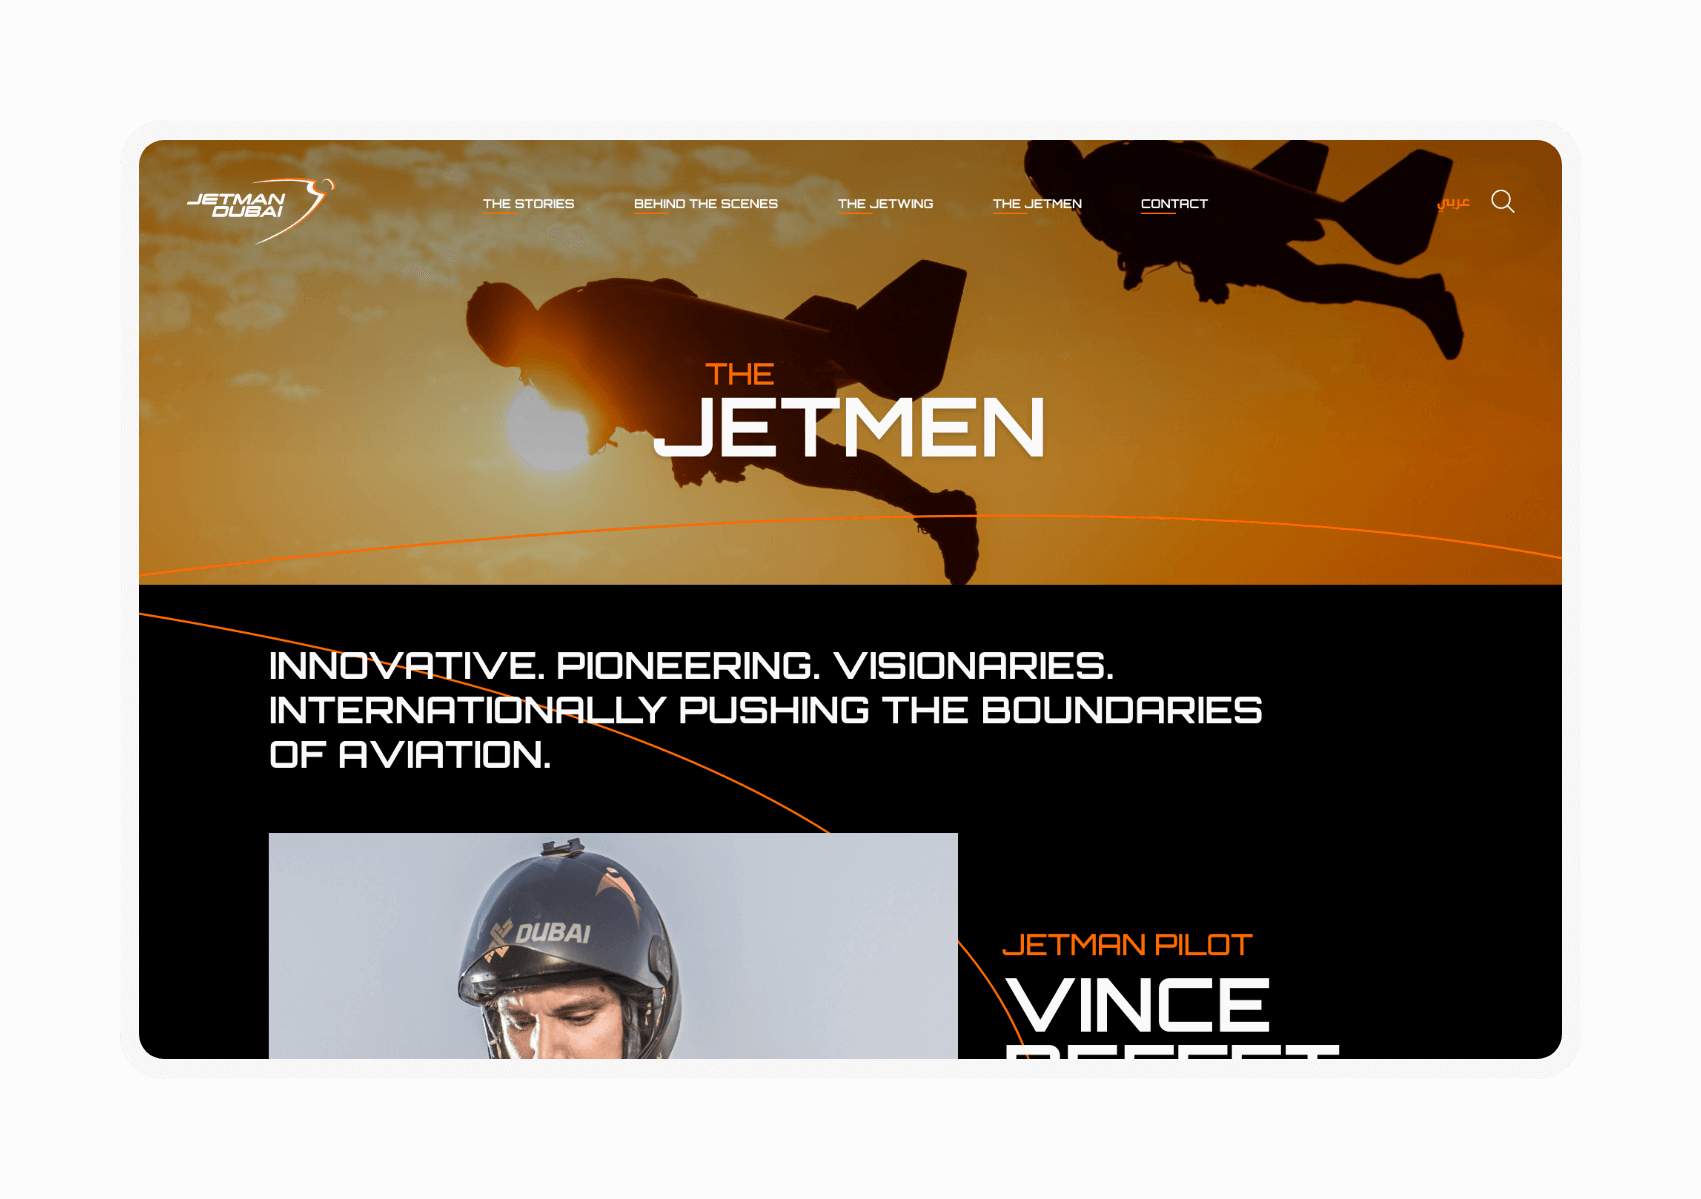 Jetman_D_005.png